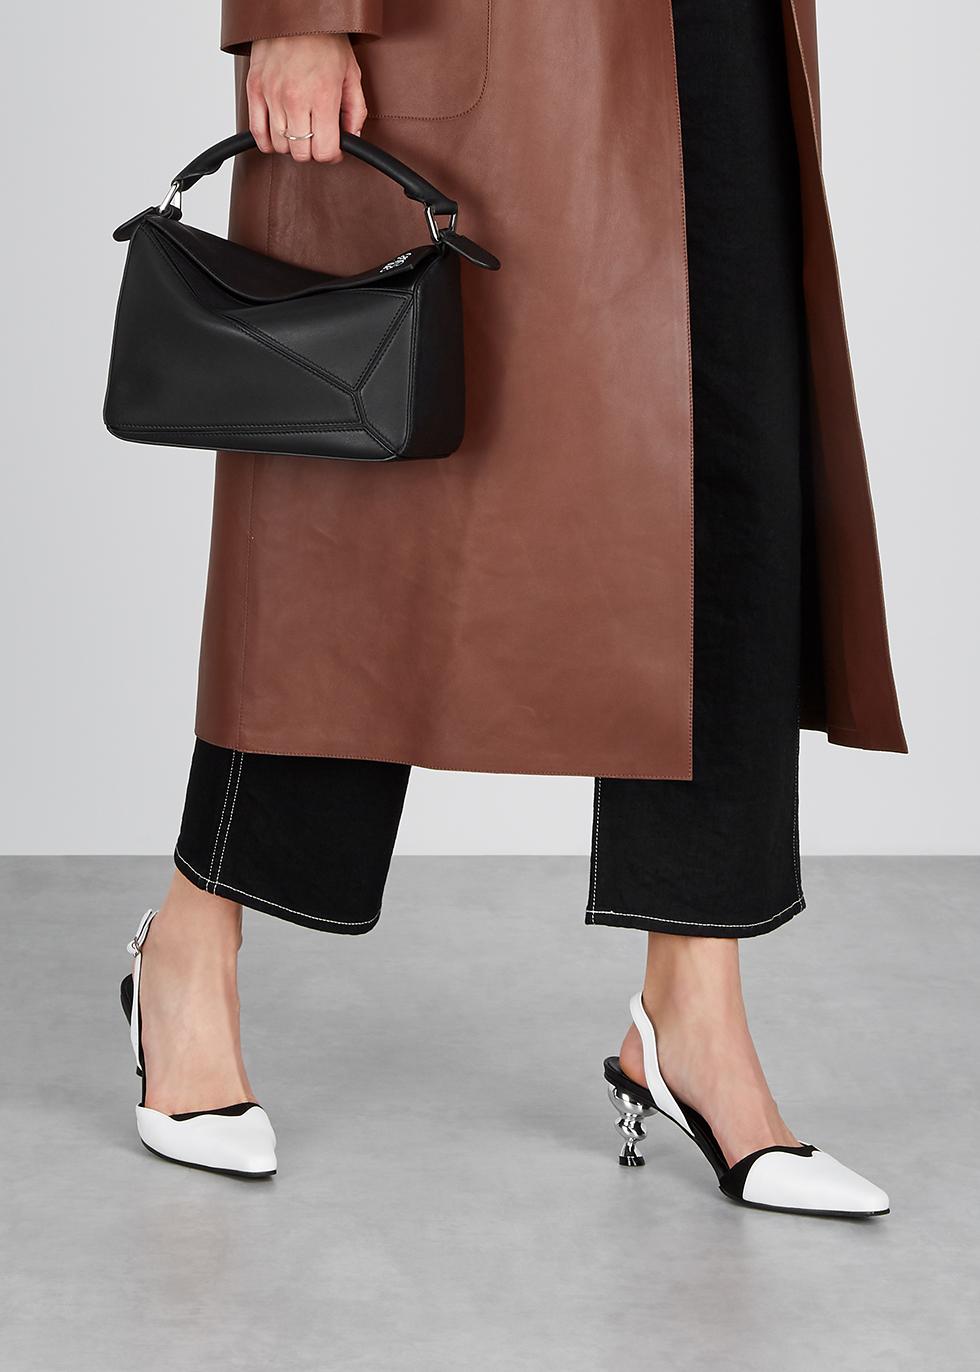 c2a4110484afea Women's Designer Bags, Handbags and Purses - Harvey Nichols